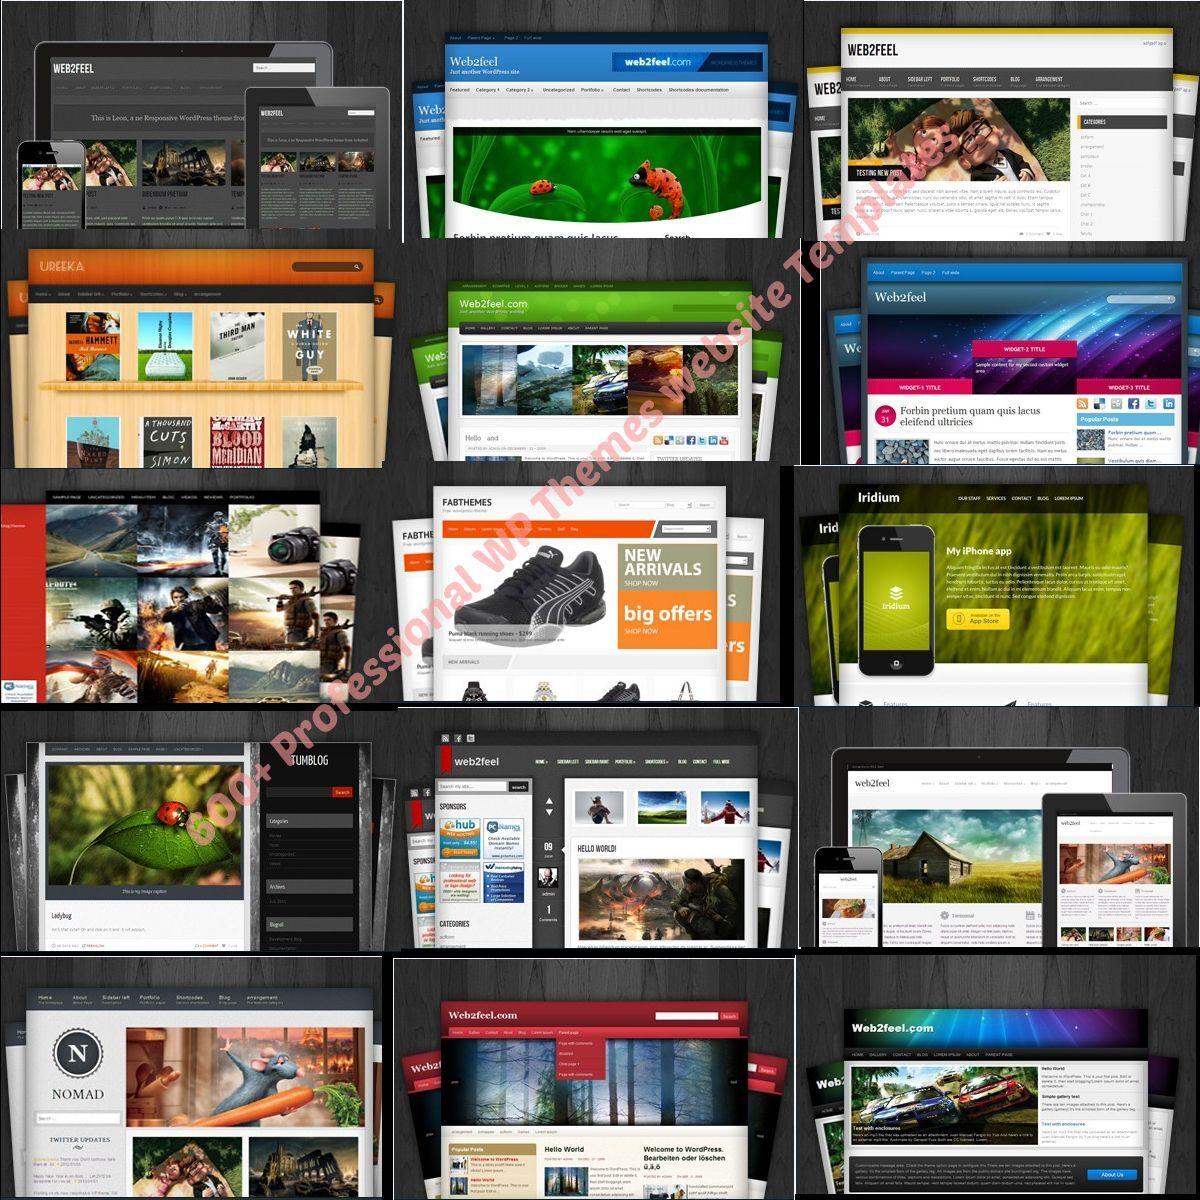 600+ WordPress Premium Themes, Plus WP Video Training and Mega-pack Clip Arts 2